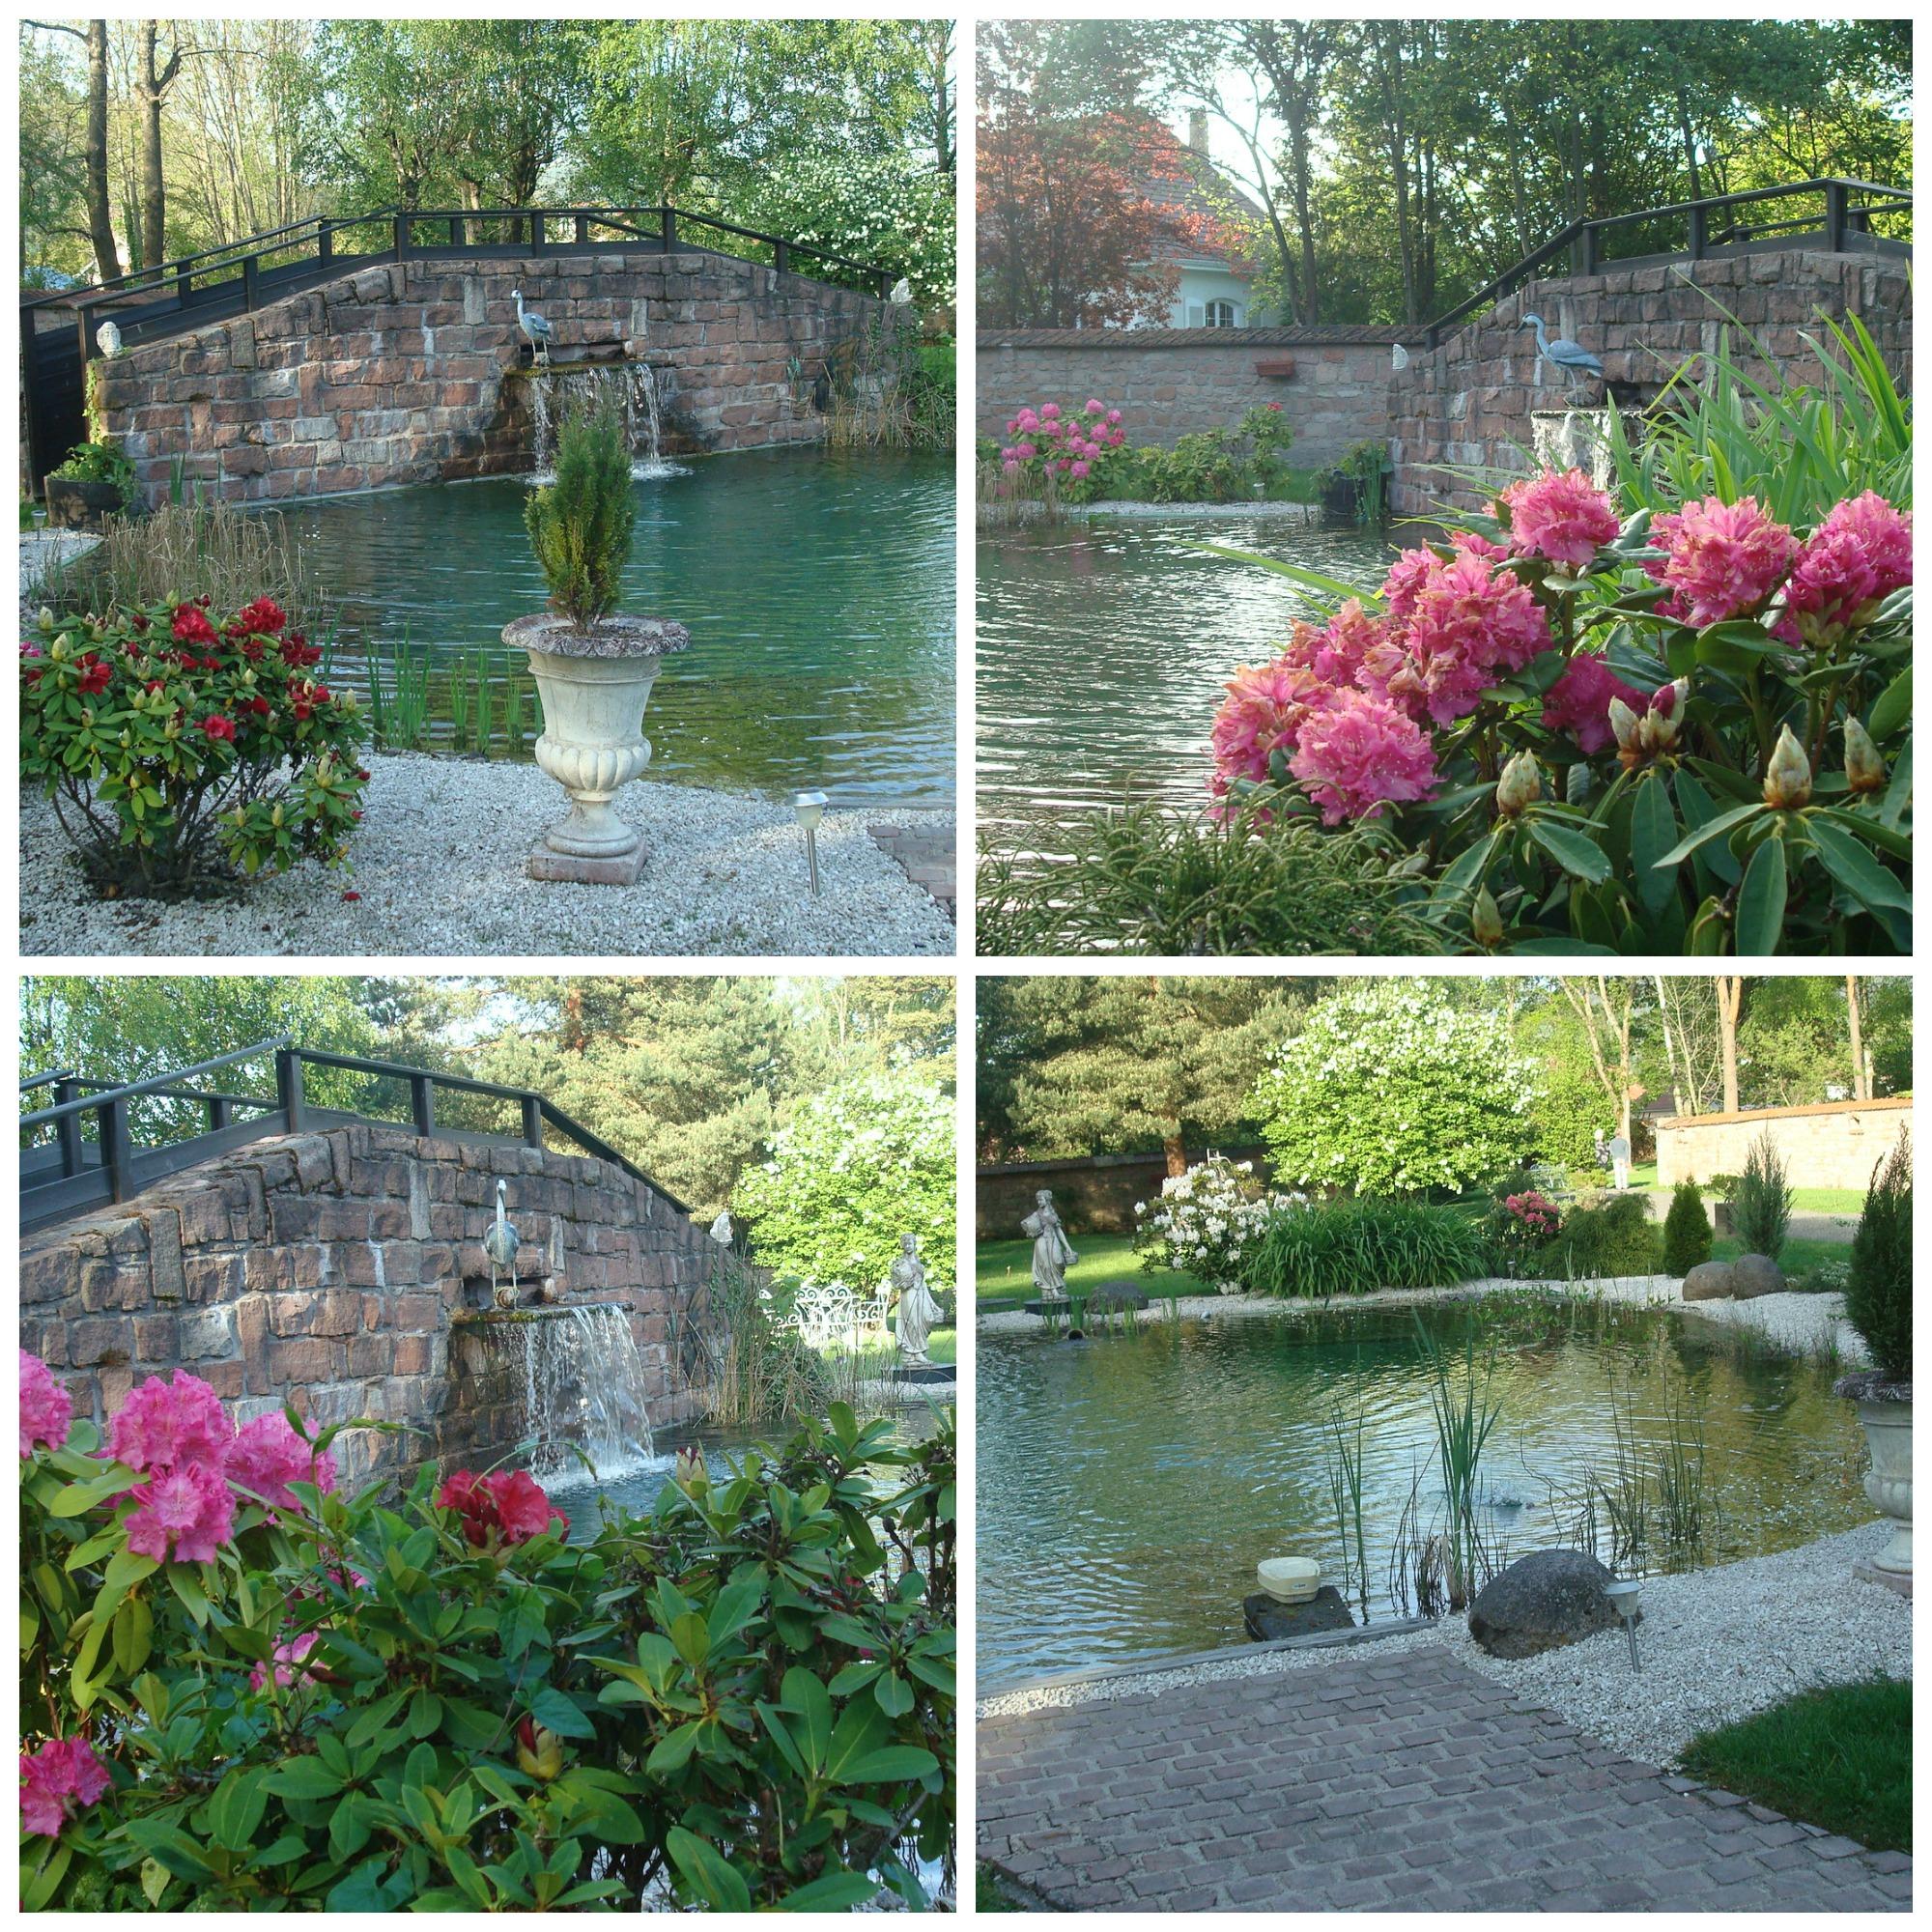 Maison d'Hôtes Les Jardins d'Aika - Raon l'Etape